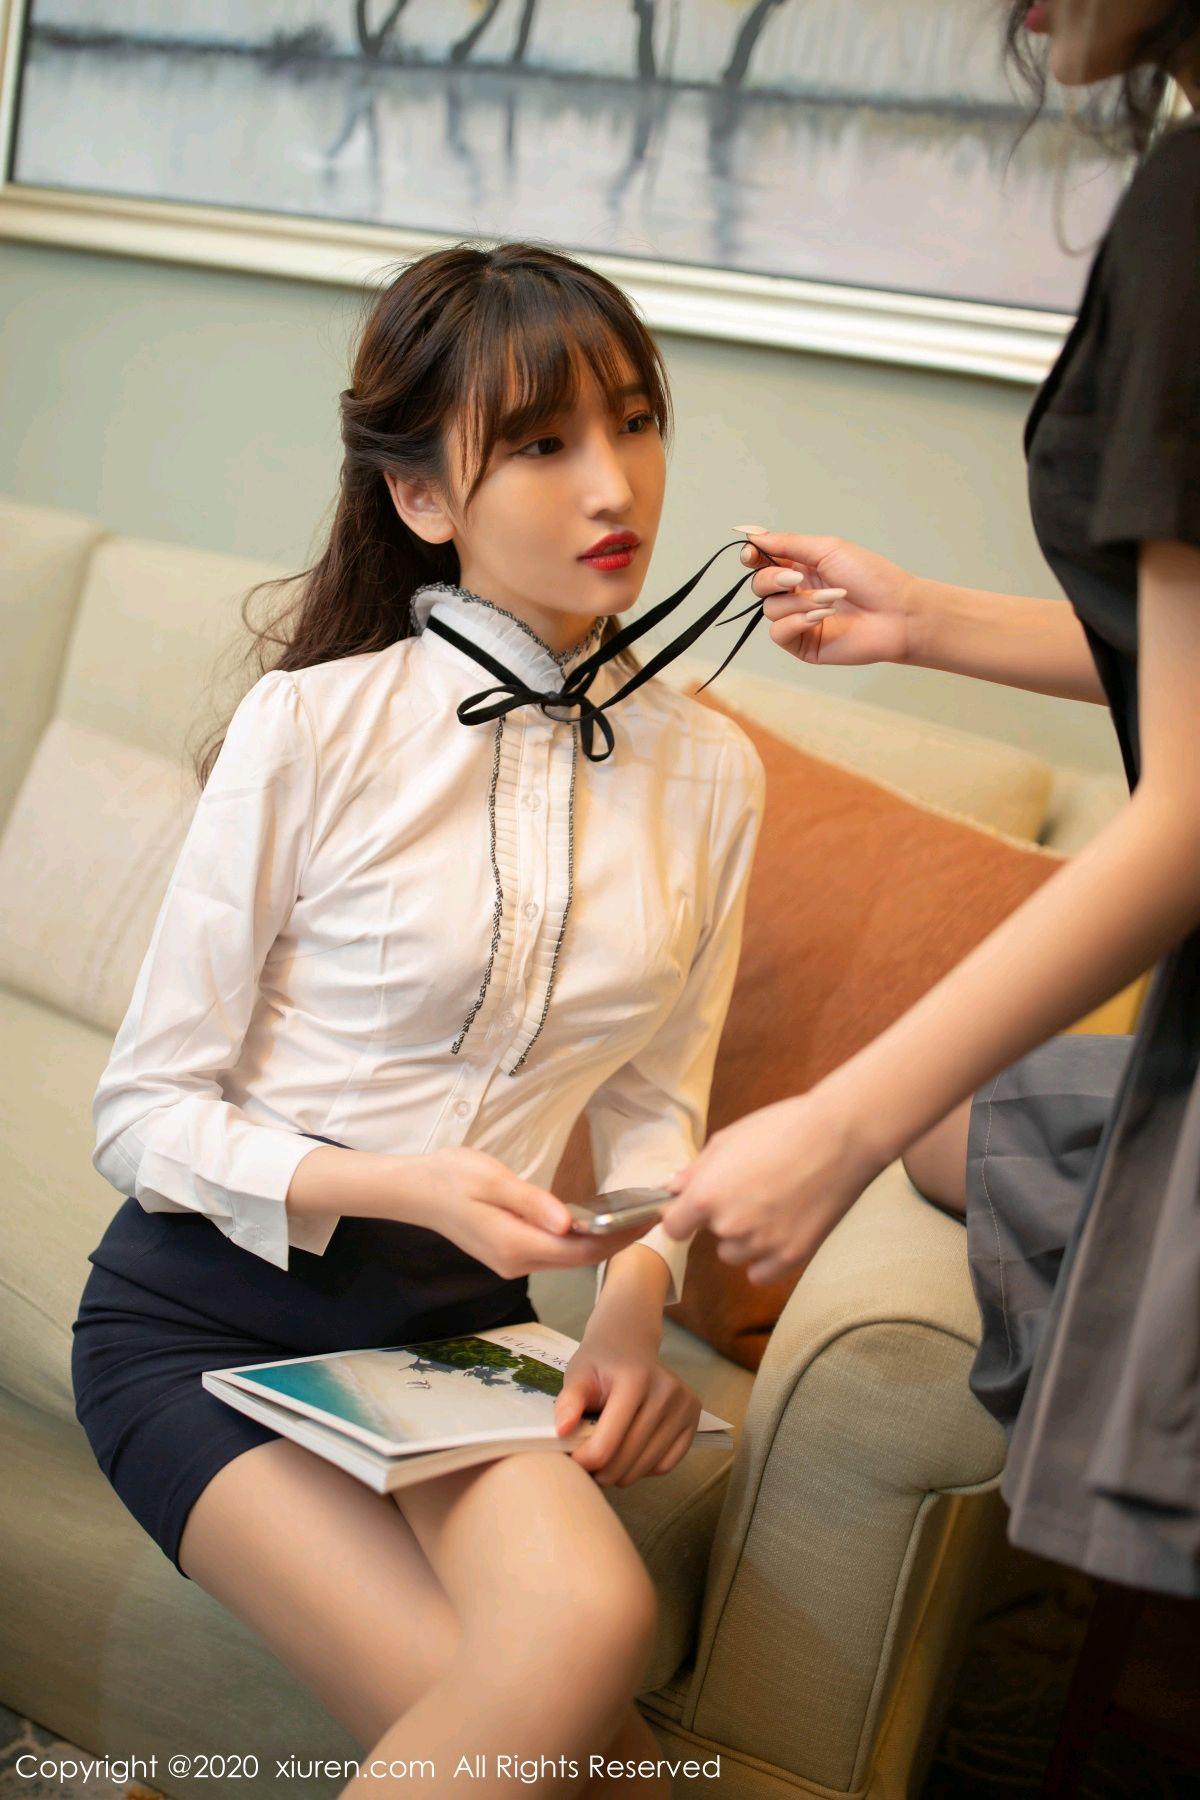 [XiuRen] Vol.2626 Secrets in mobile phones 17P, Chen Xiao Miao, Lu Xuan Xuan, School Uniform, Sisters, Xiuren